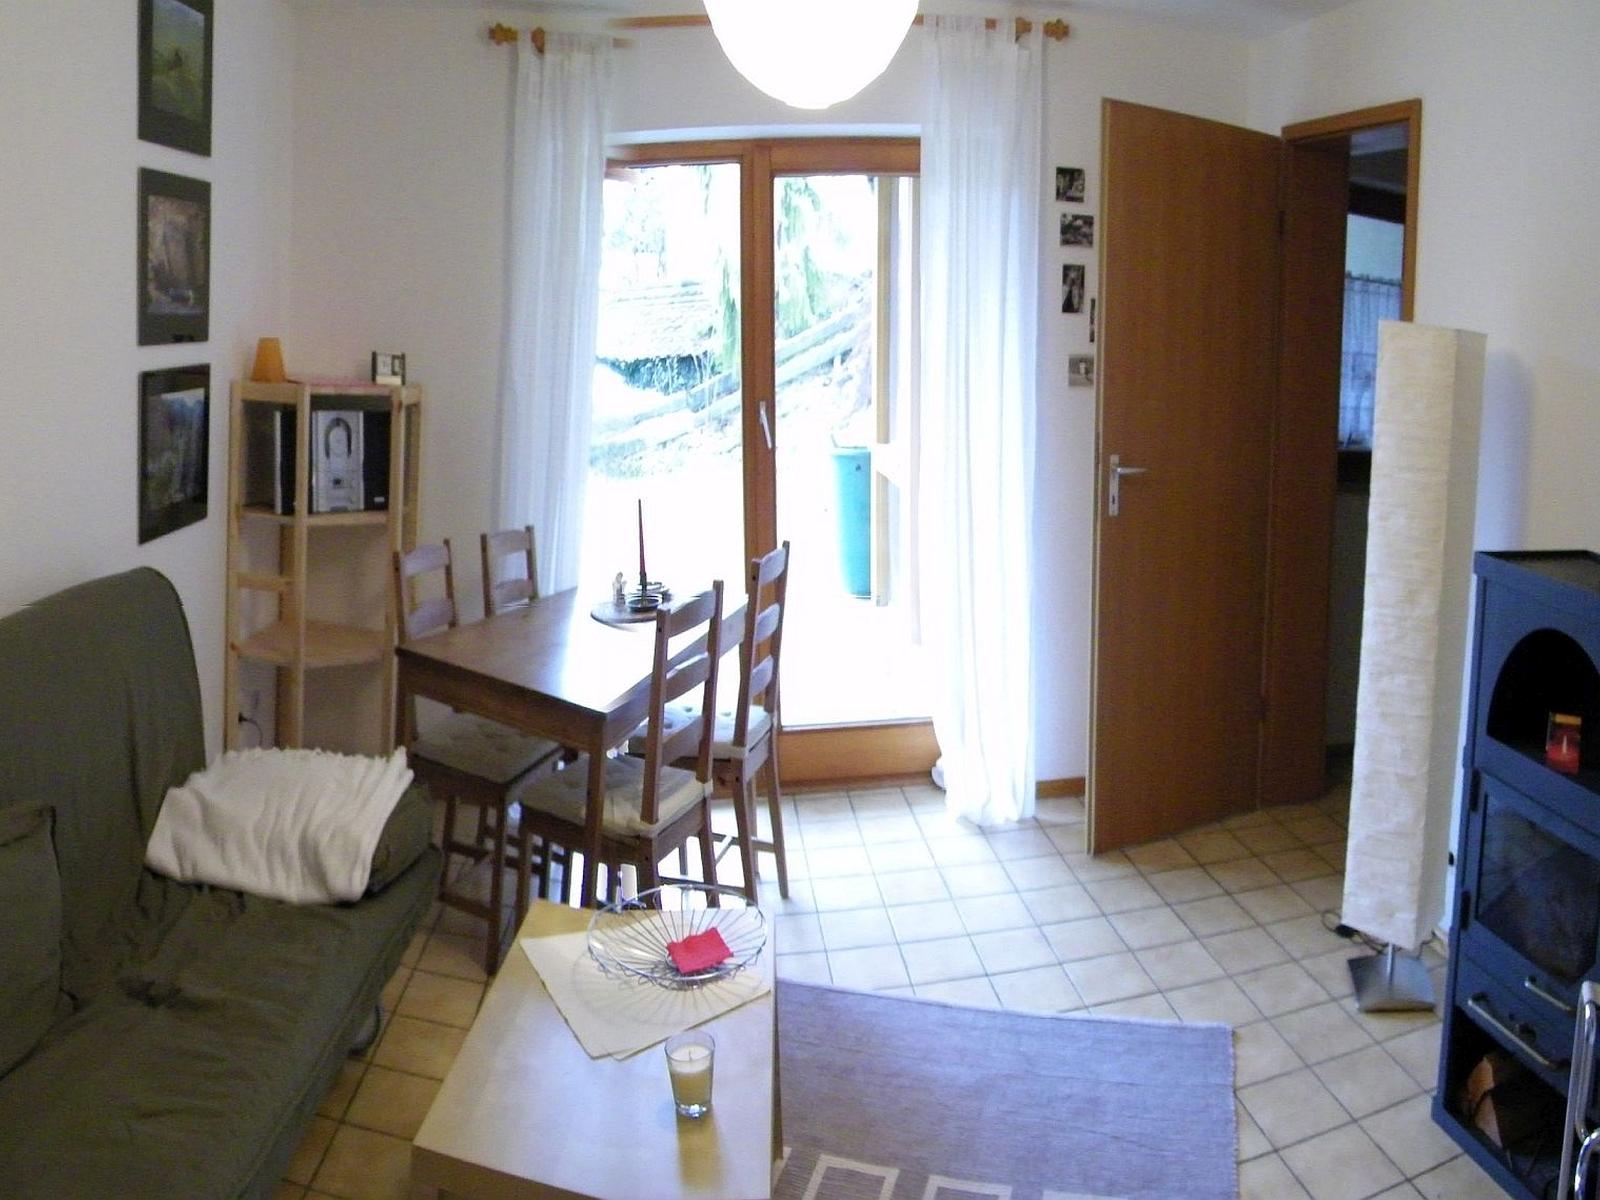 ferienwohnung haus beate tourismus kultur stockach. Black Bedroom Furniture Sets. Home Design Ideas